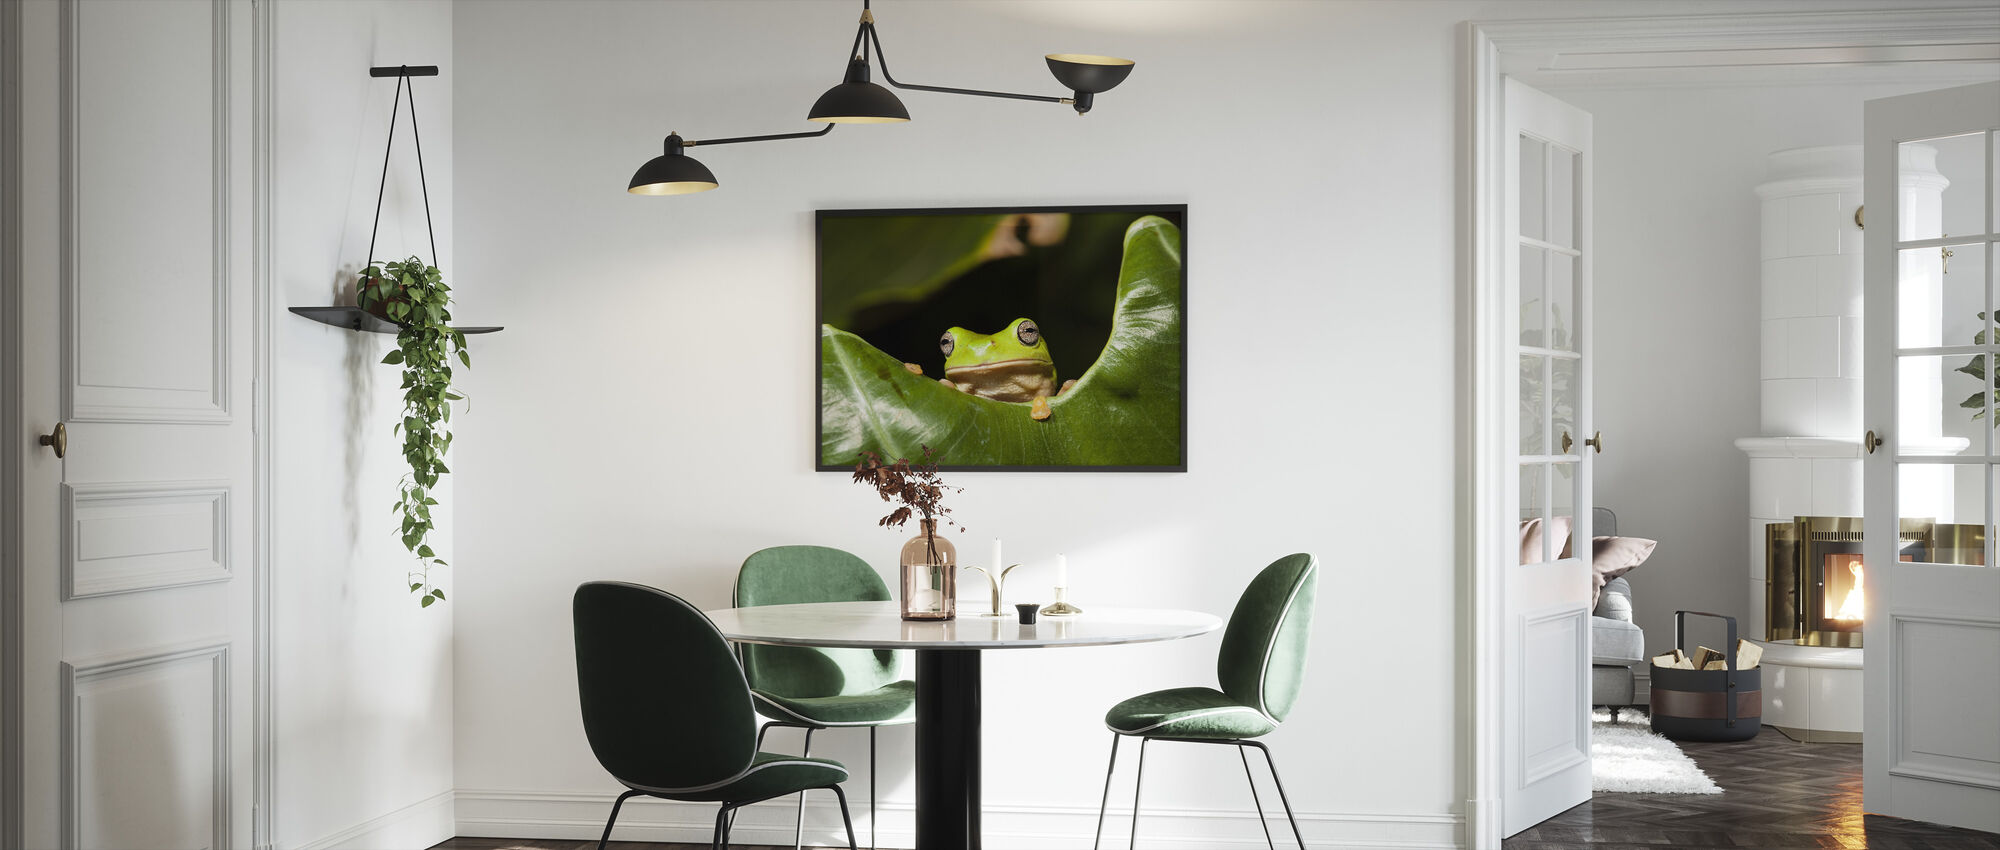 Green Tree Frog - Framed print - Kitchen